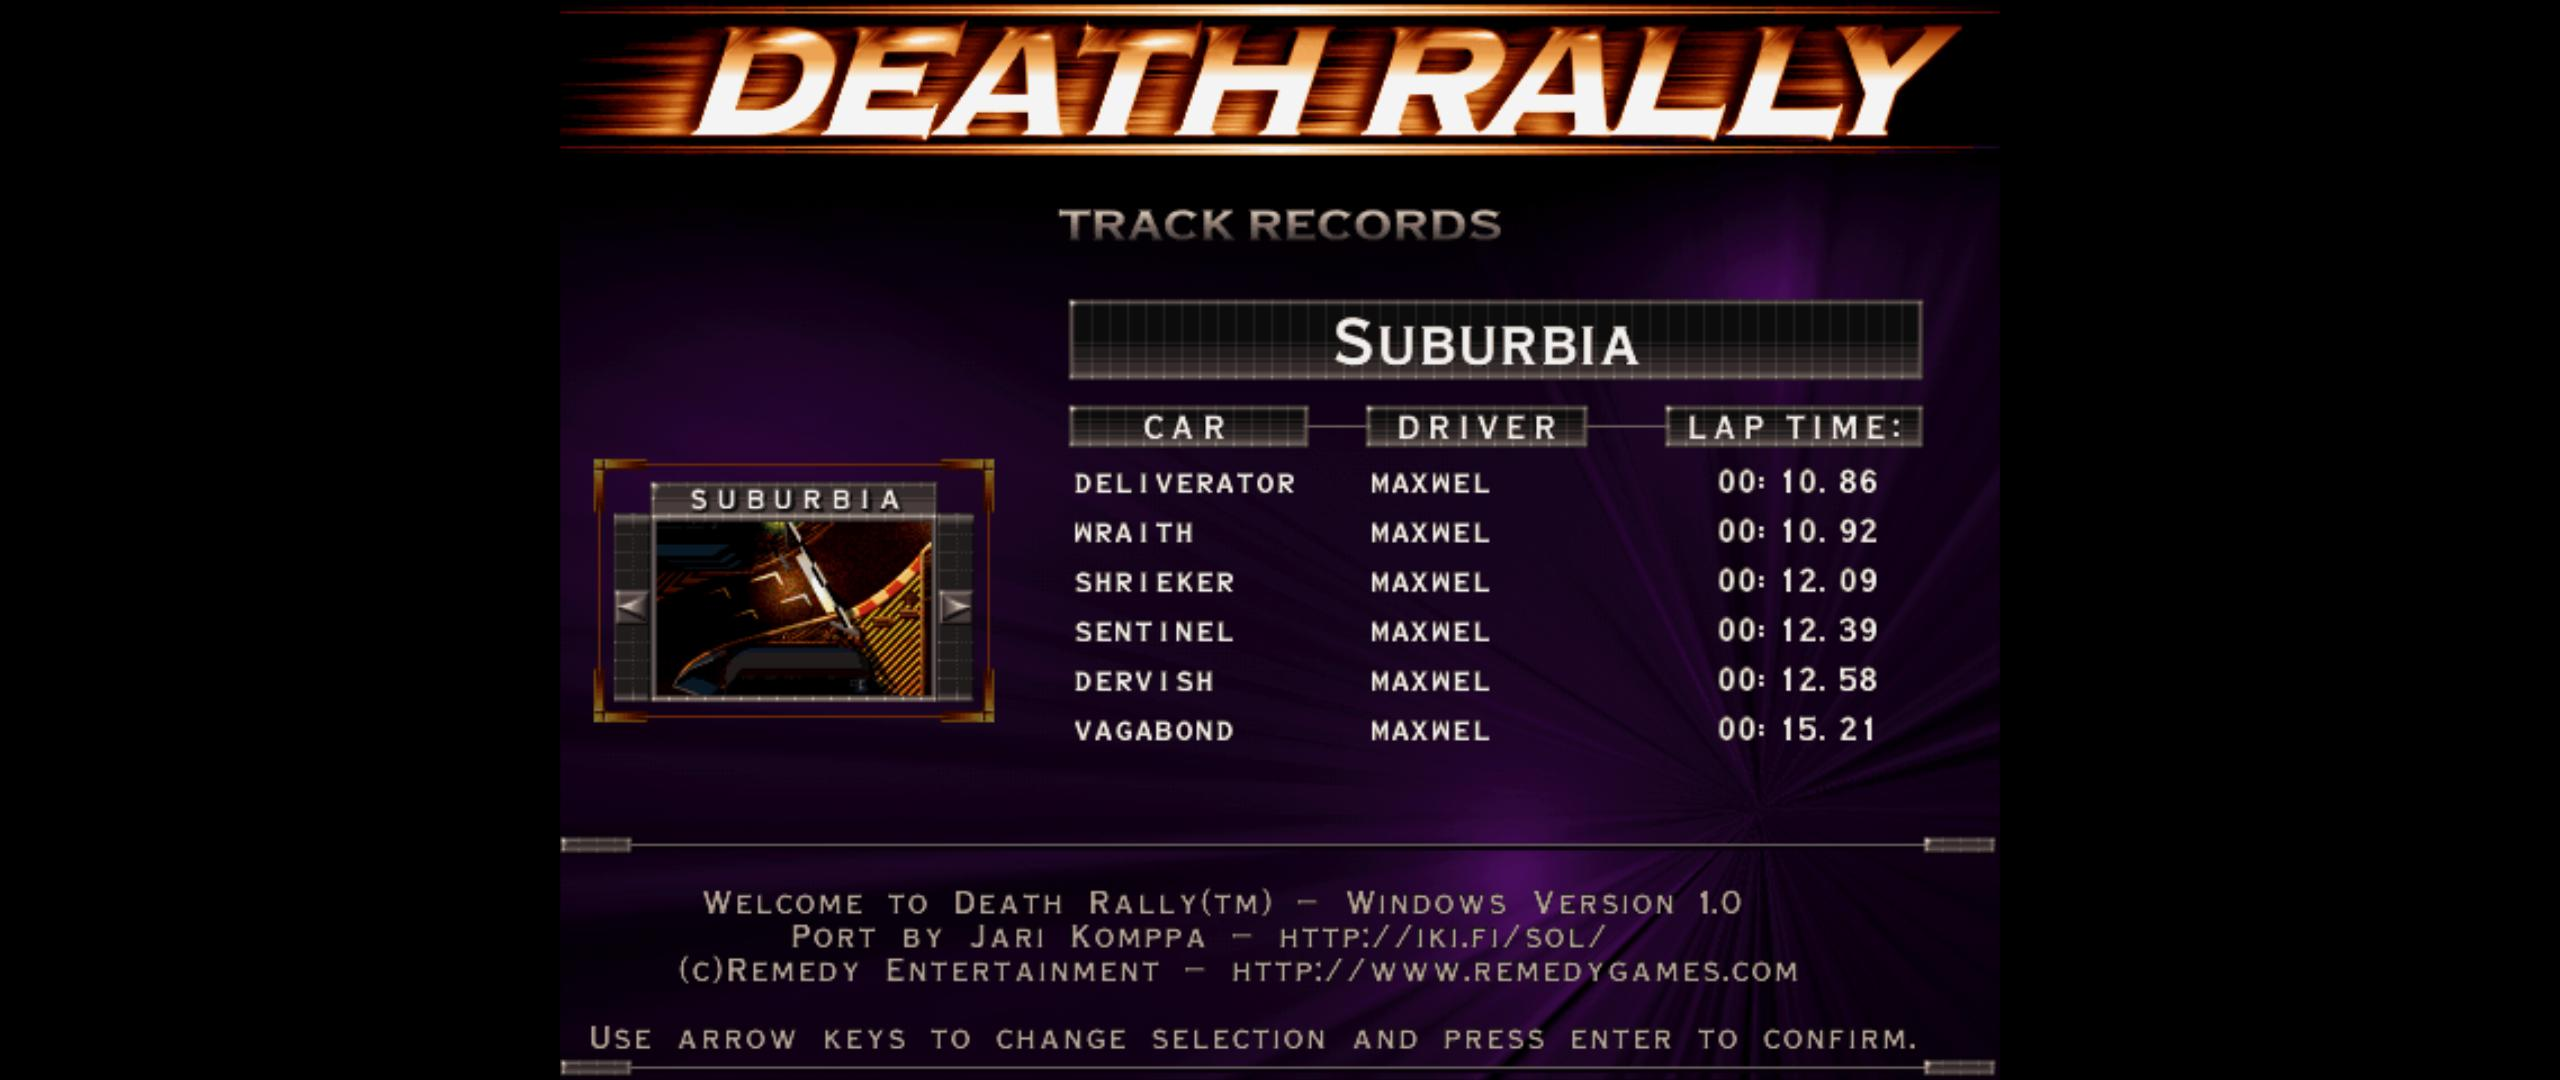 Maxwel: Death Rally [Suburbia, Sentinel Car] (PC) 0:00:12.39 points on 2016-03-01 14:40:10